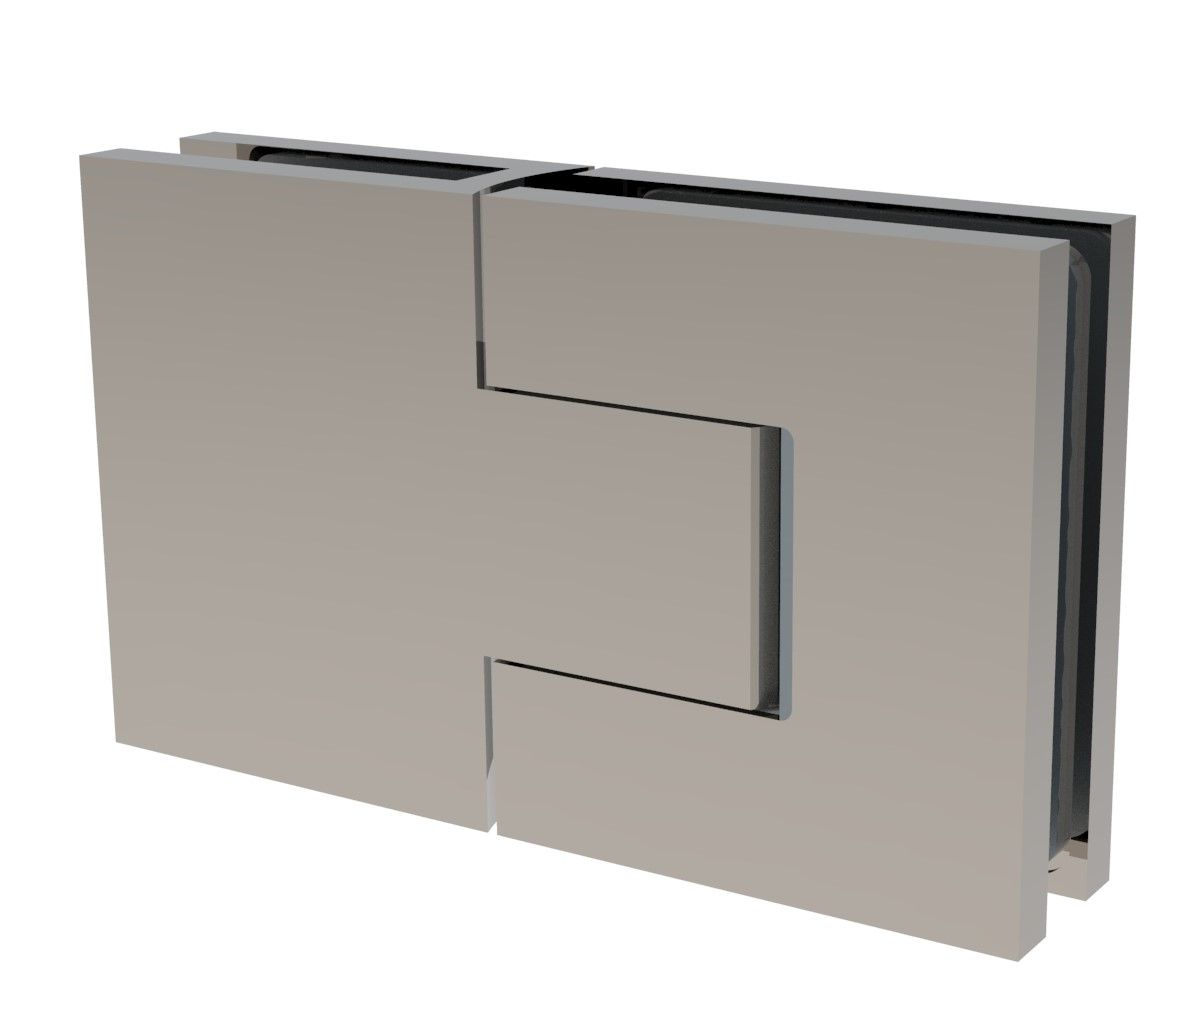 CRL BELLAGIO Adjustable Shower Hinge, 180° Glass-Glass, Cover Plates